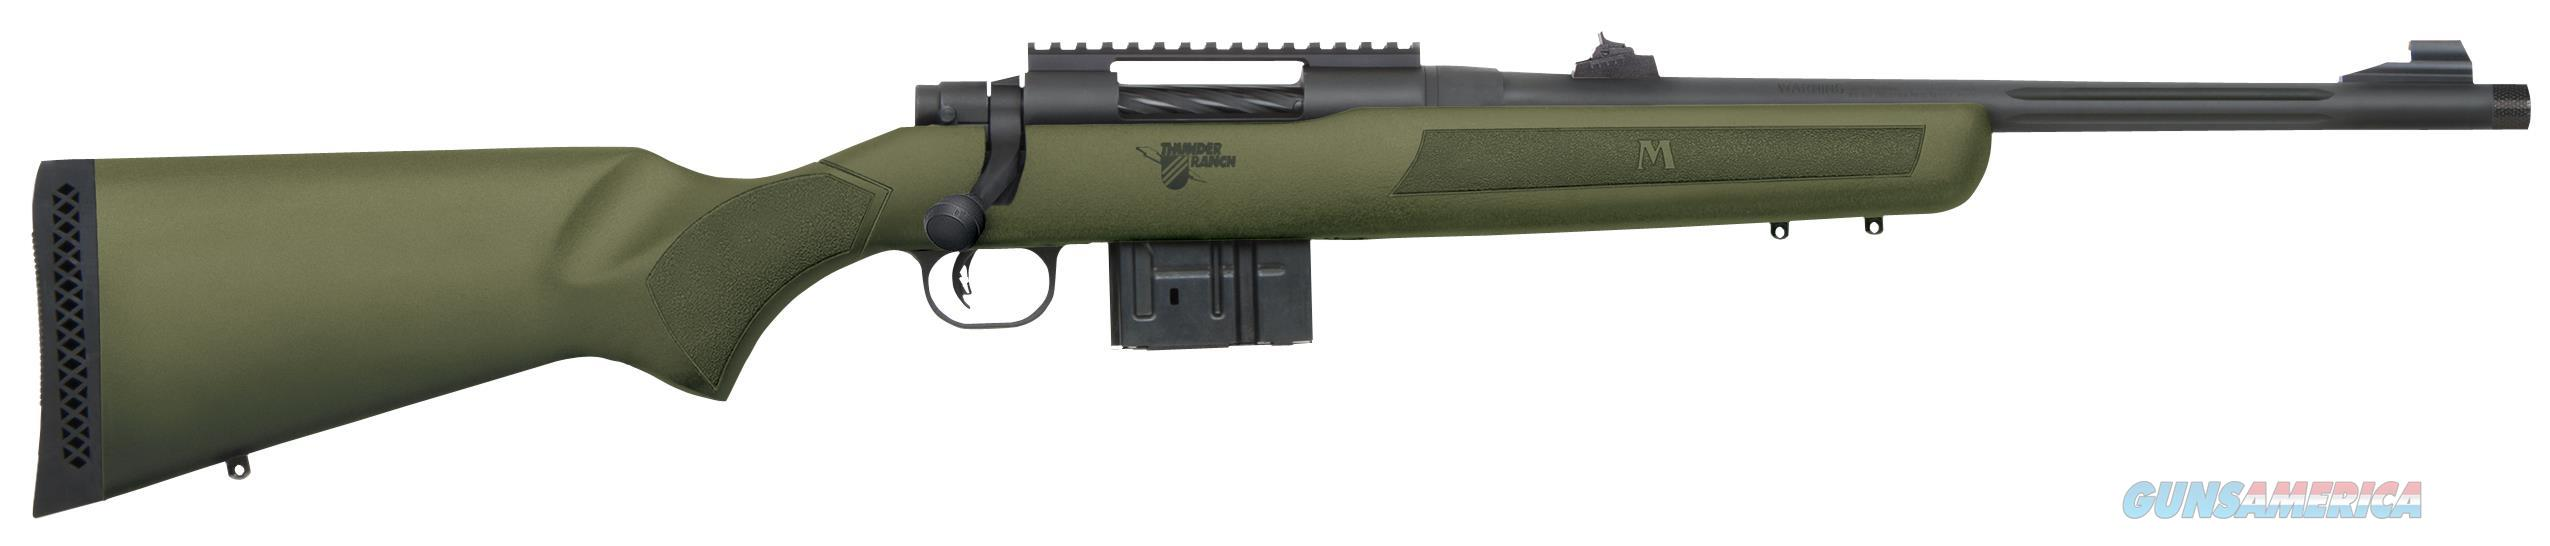 "Mossberg 27798 Mvp Thunder Ranch Bolt 308 Winchester/7.62 Nato 18.5"" 10+1 Synthetic Od Green Stk Blued 27798  Guns > Rifles > MN Misc Rifles"